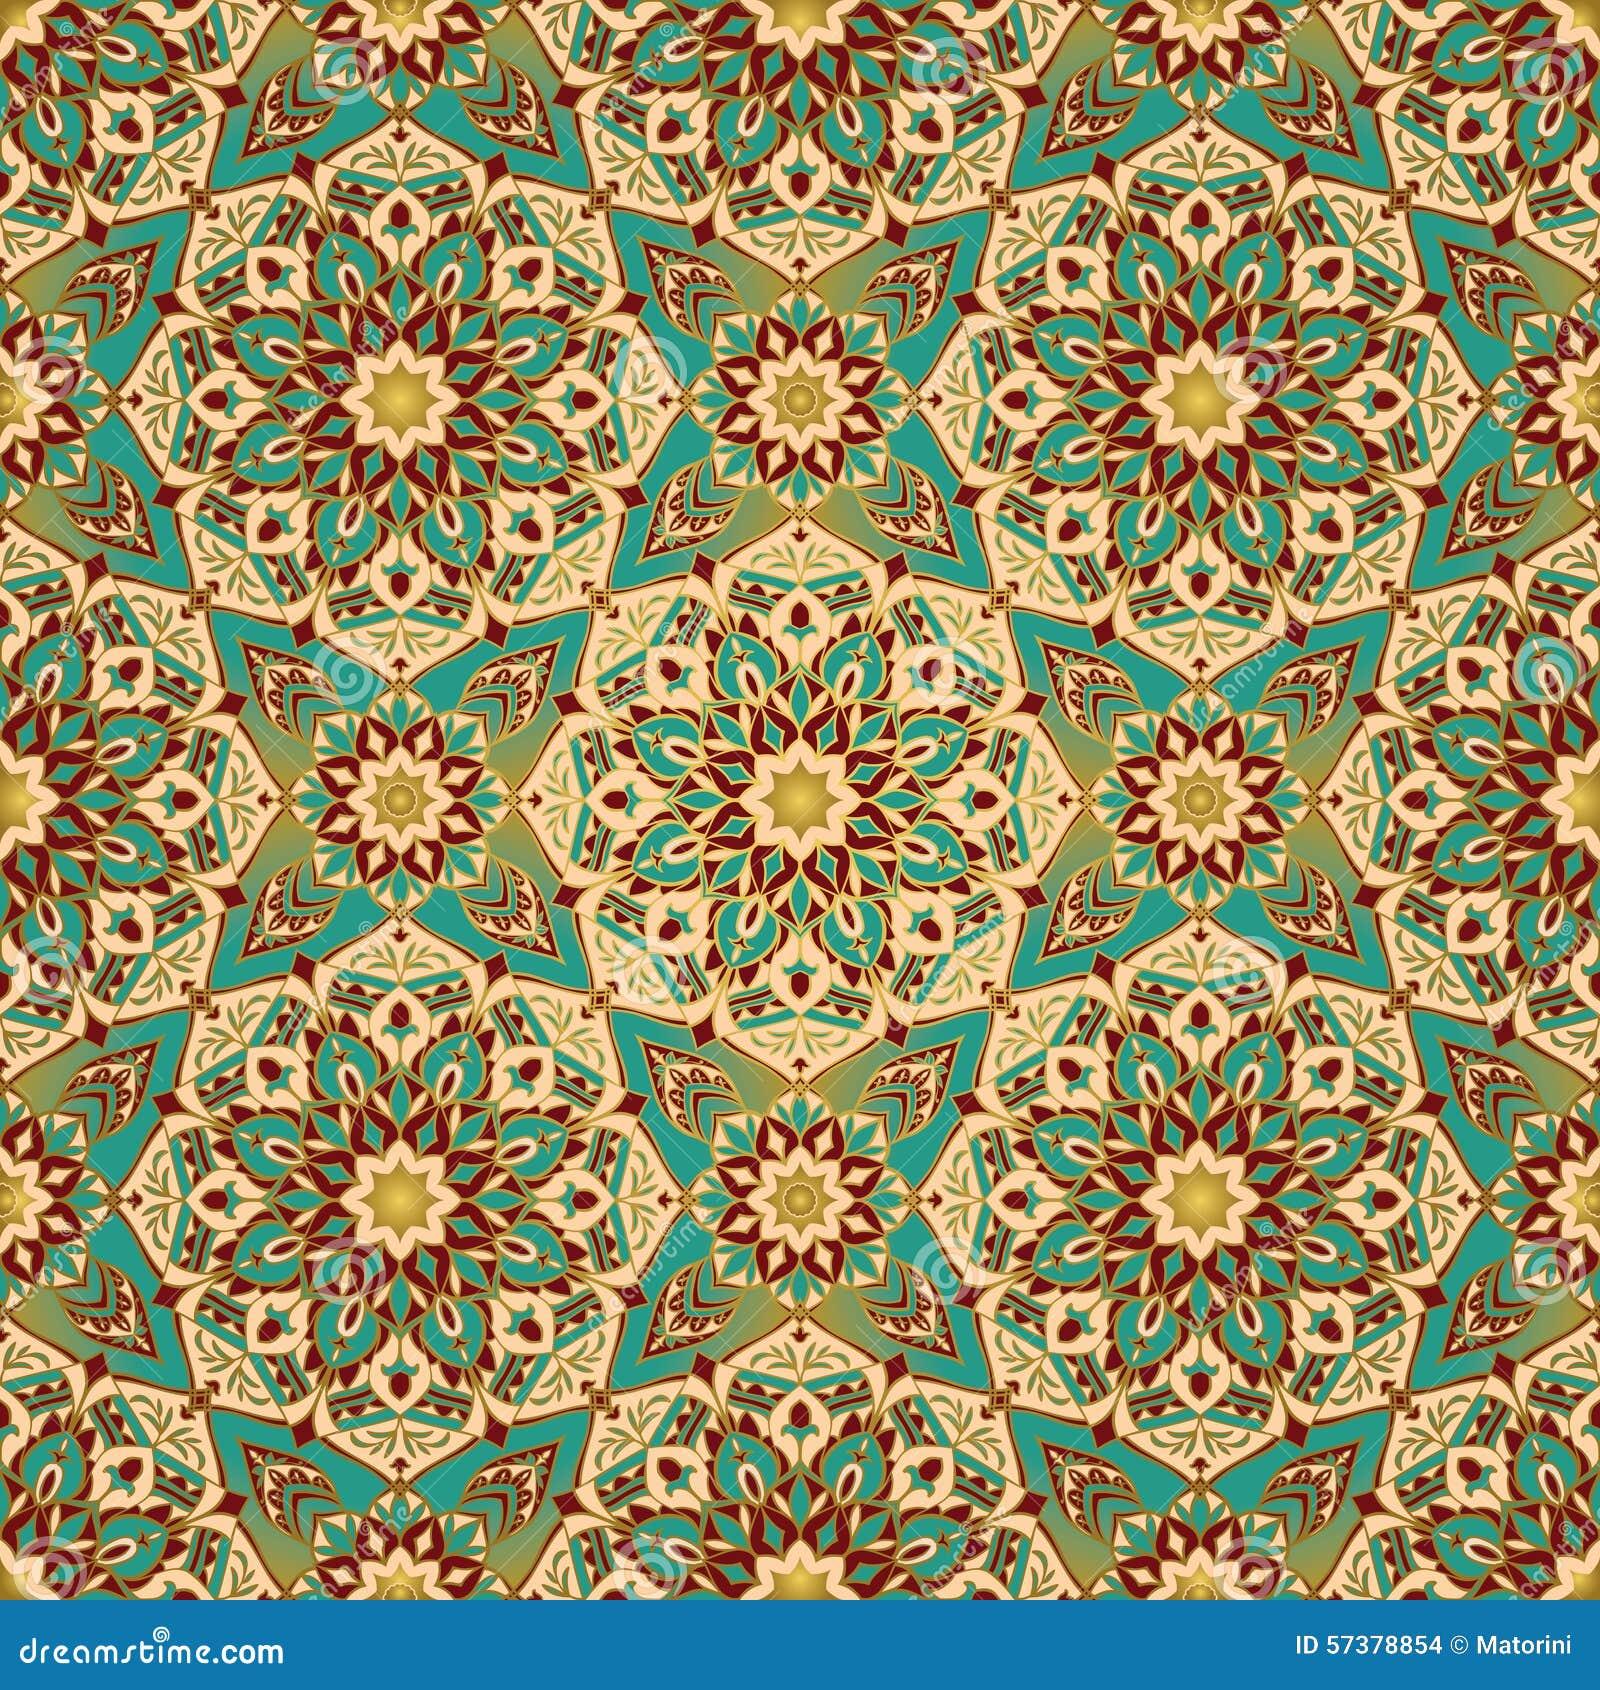 East Ornate Geometric Decor Stock Vector Image 57378854